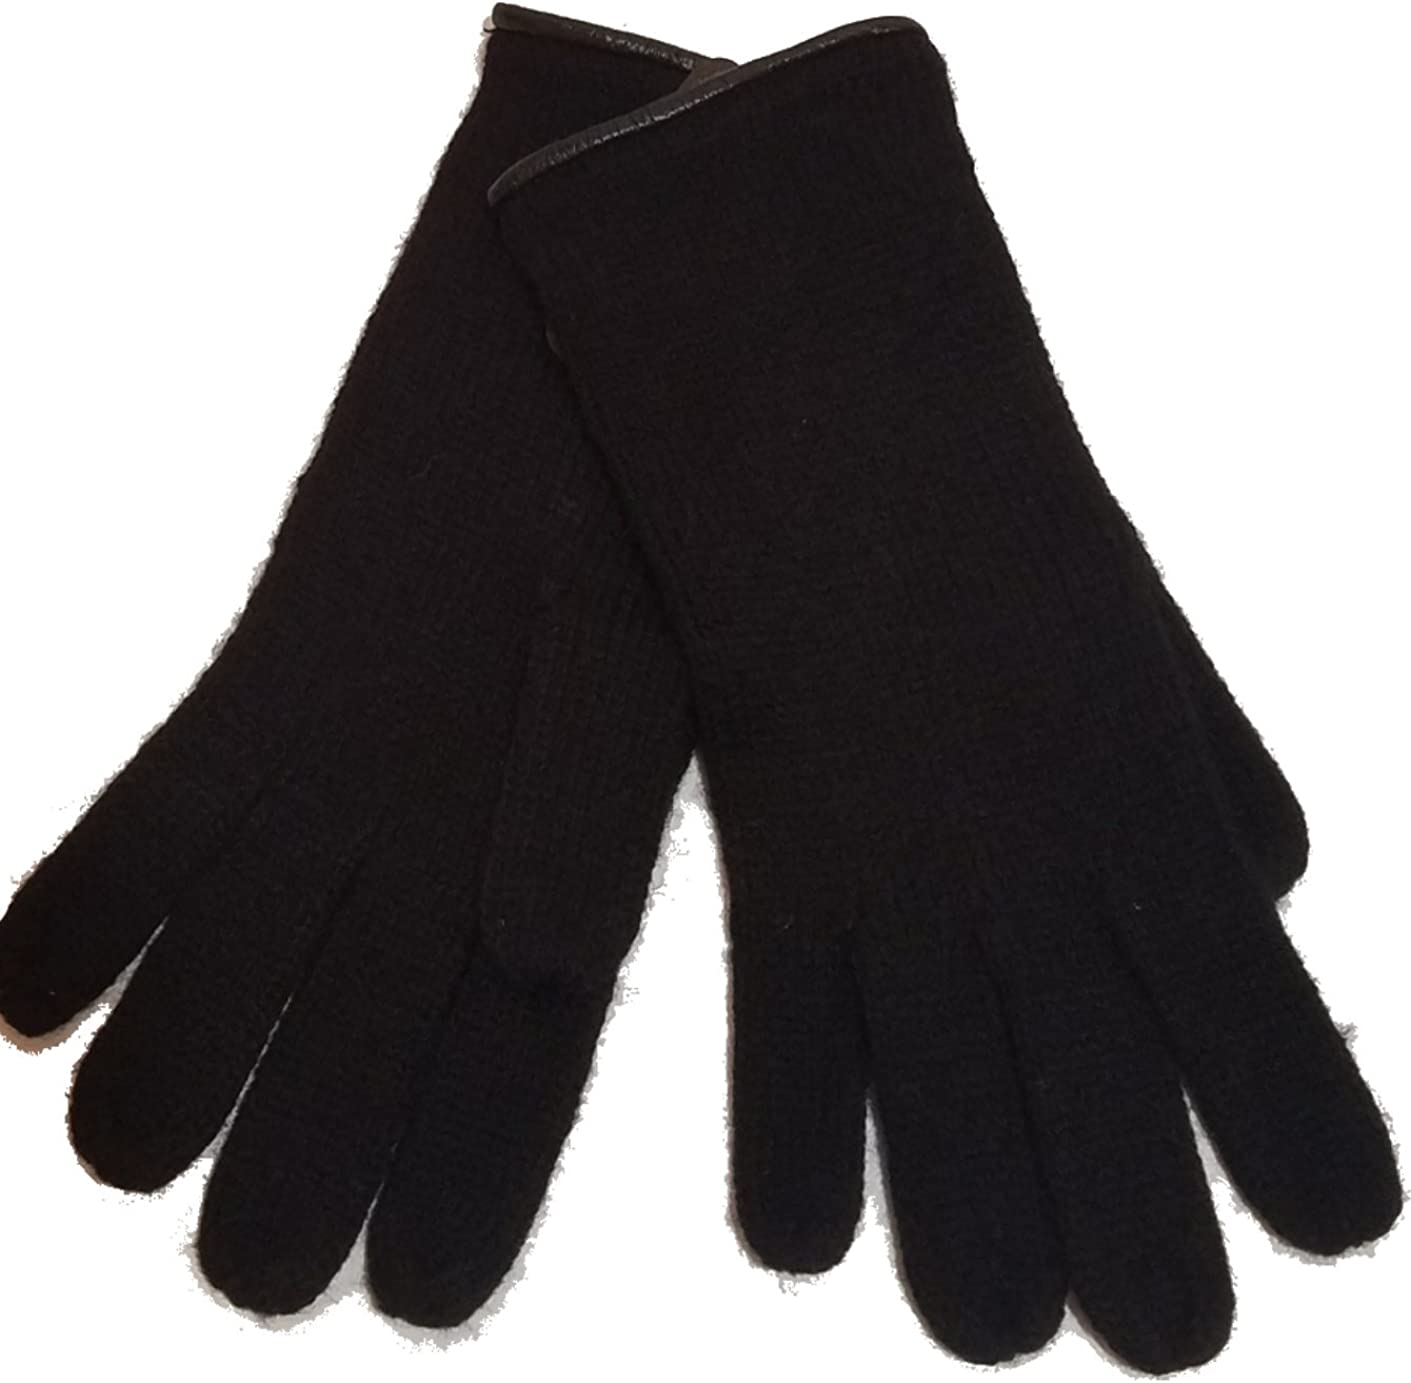 Michael Kors Leather Trim Gloves, Black